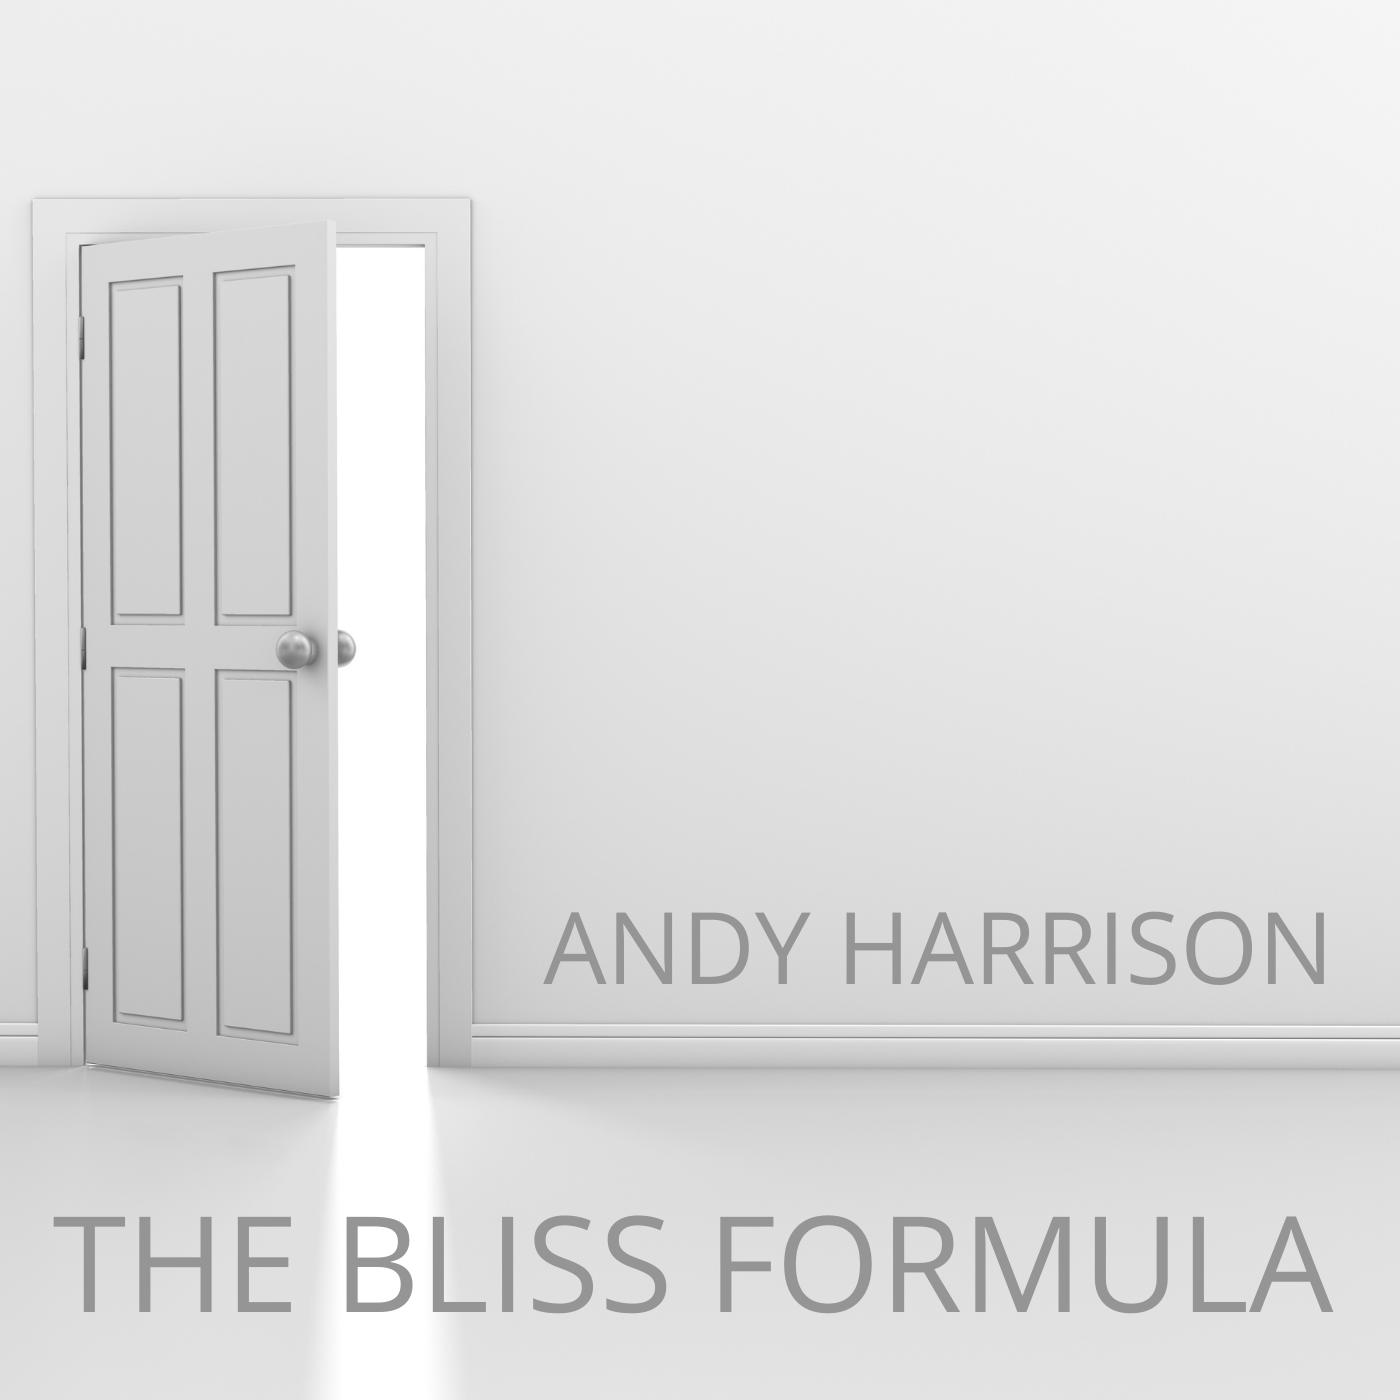 The Bliss Formula Album Cover